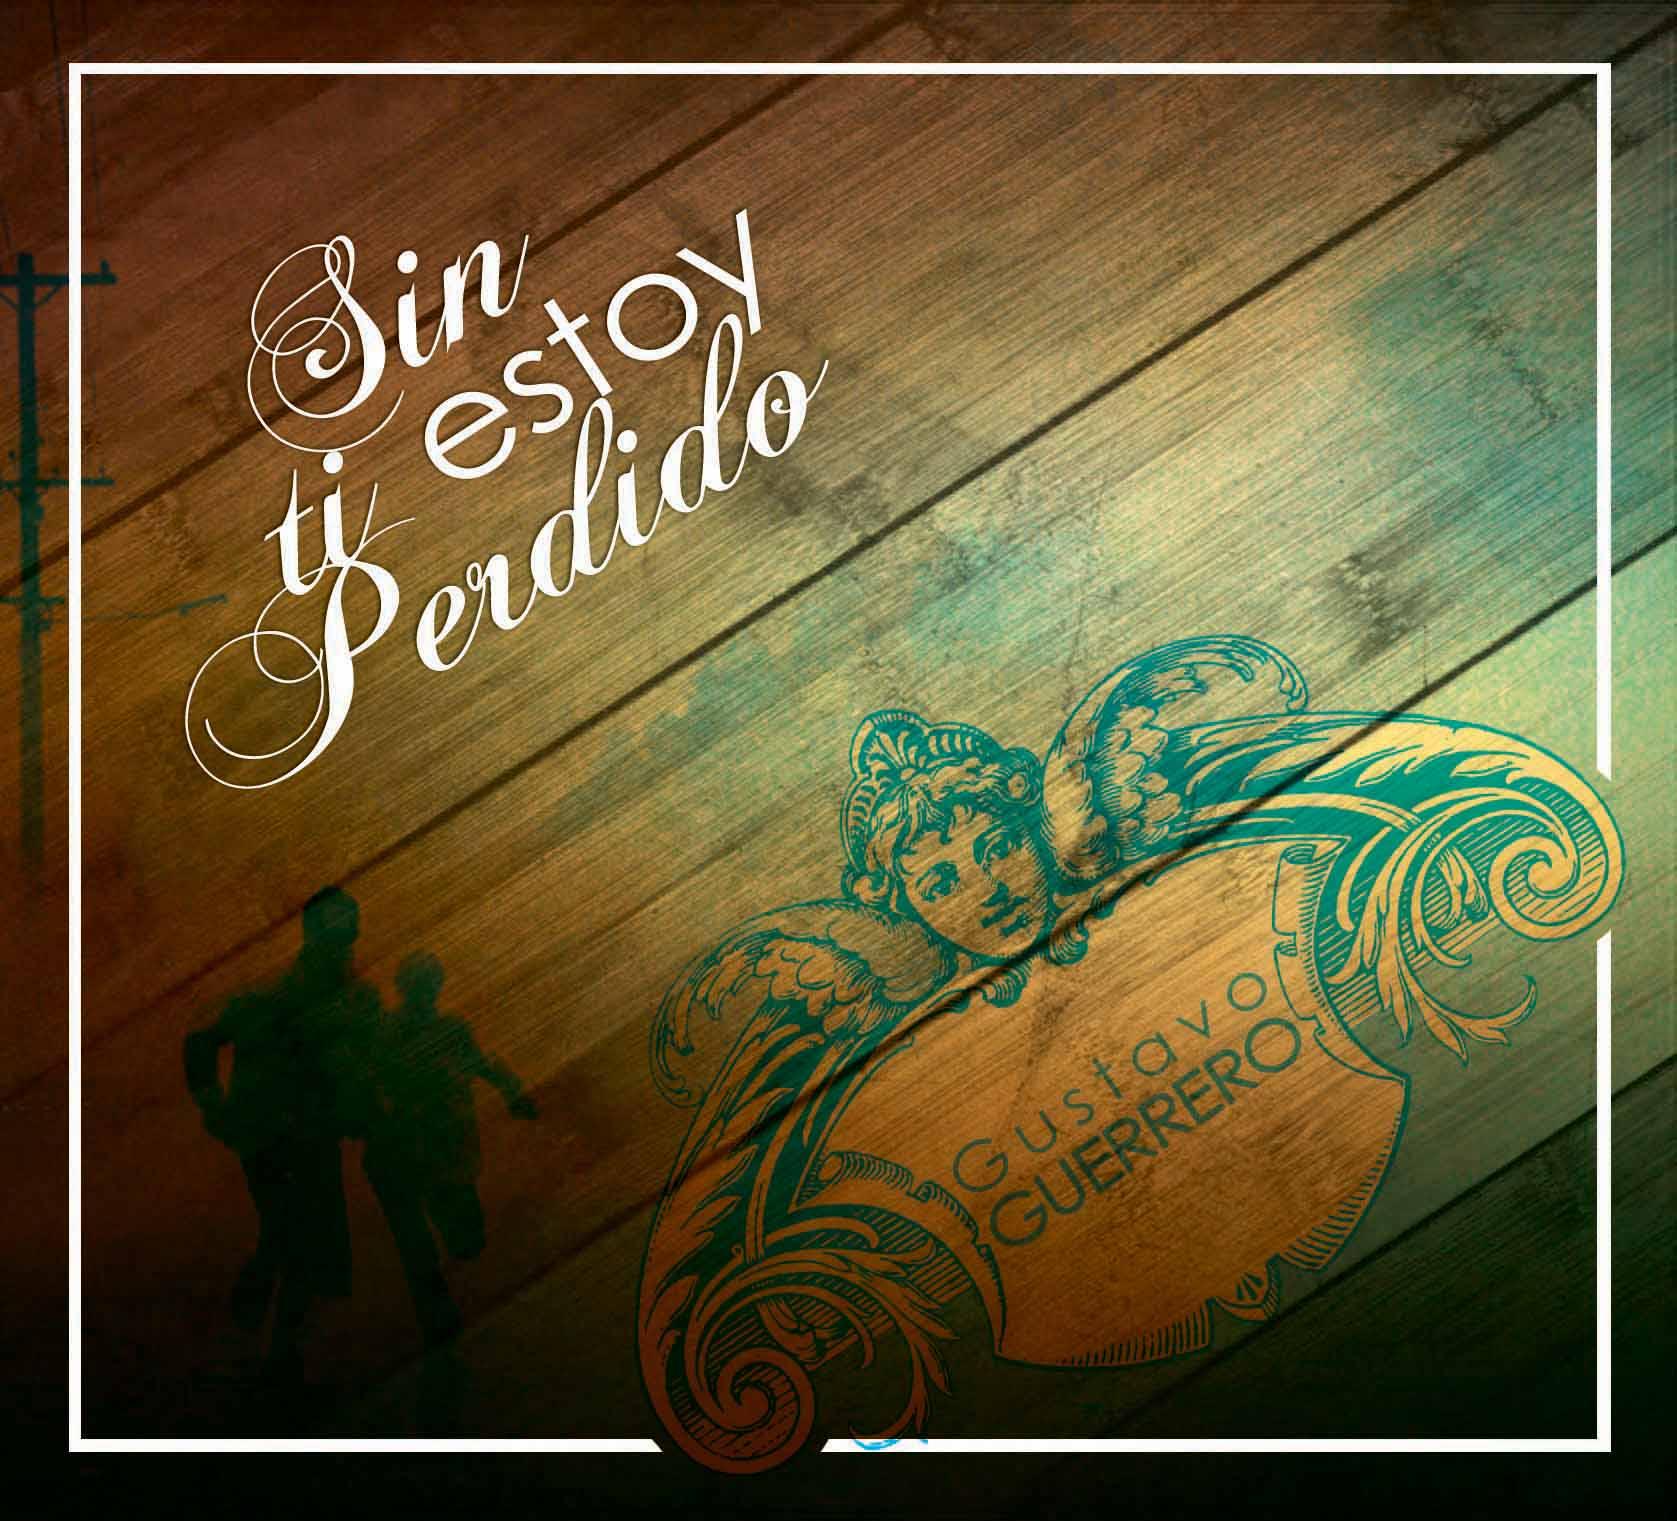 Gustavo cd cover.jpg